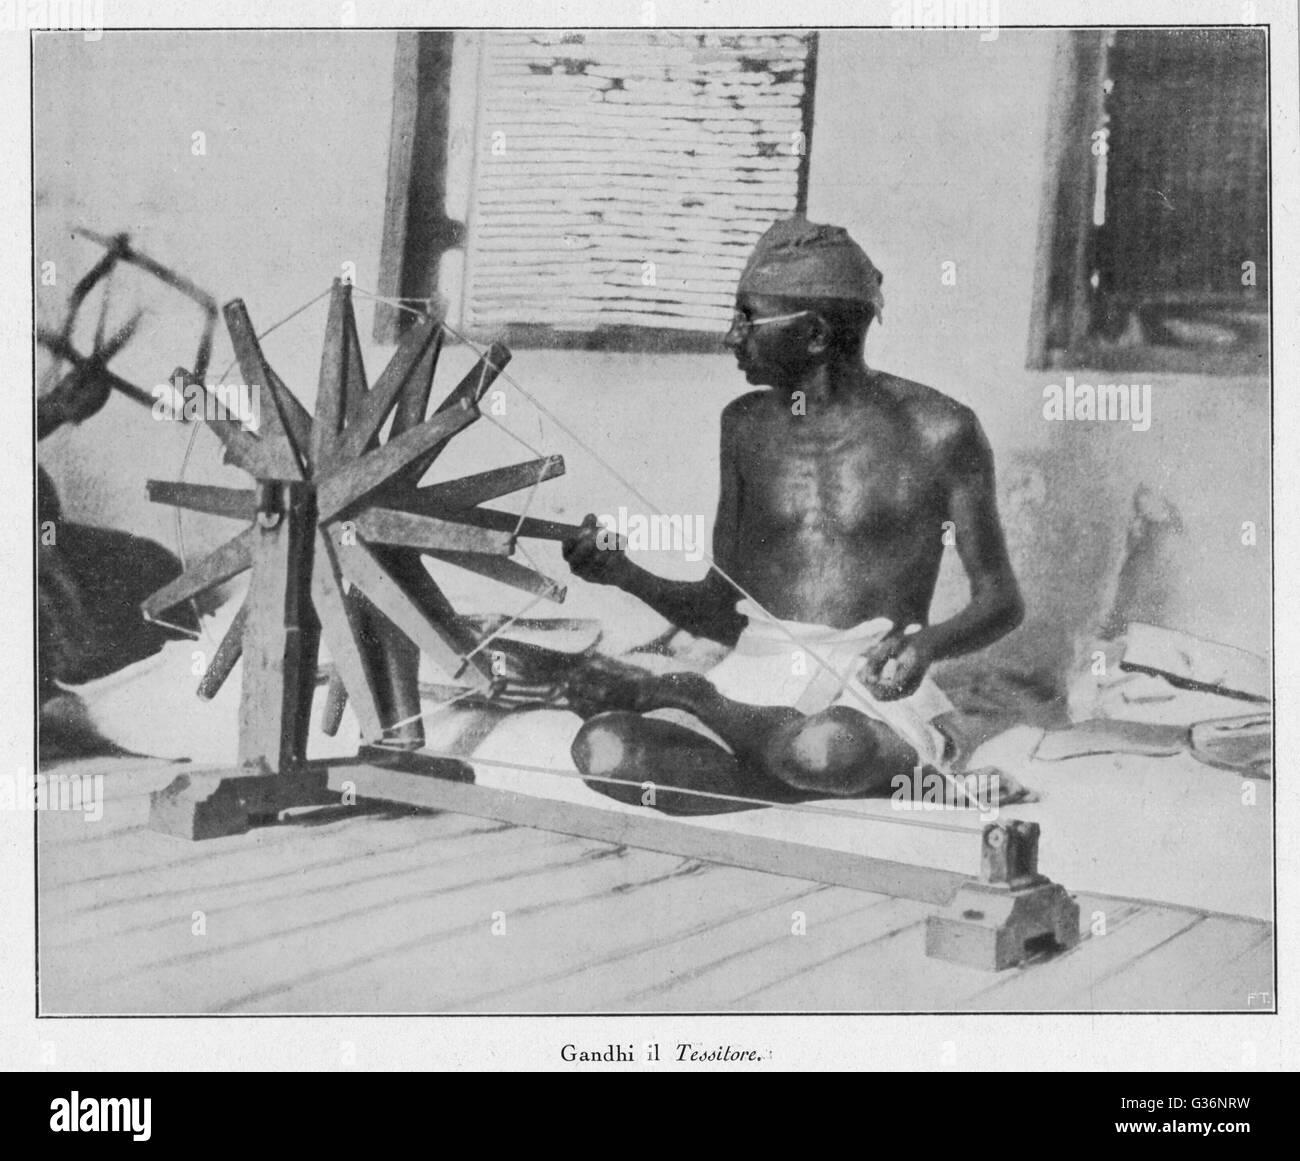 mahatma gandhi n nationalist and spiritual leader spinning mahatma gandhi n nationalist and spiritual leader spinning at his wheel charakha in 1931 demonstrating his strong work ethic date 1869 1948